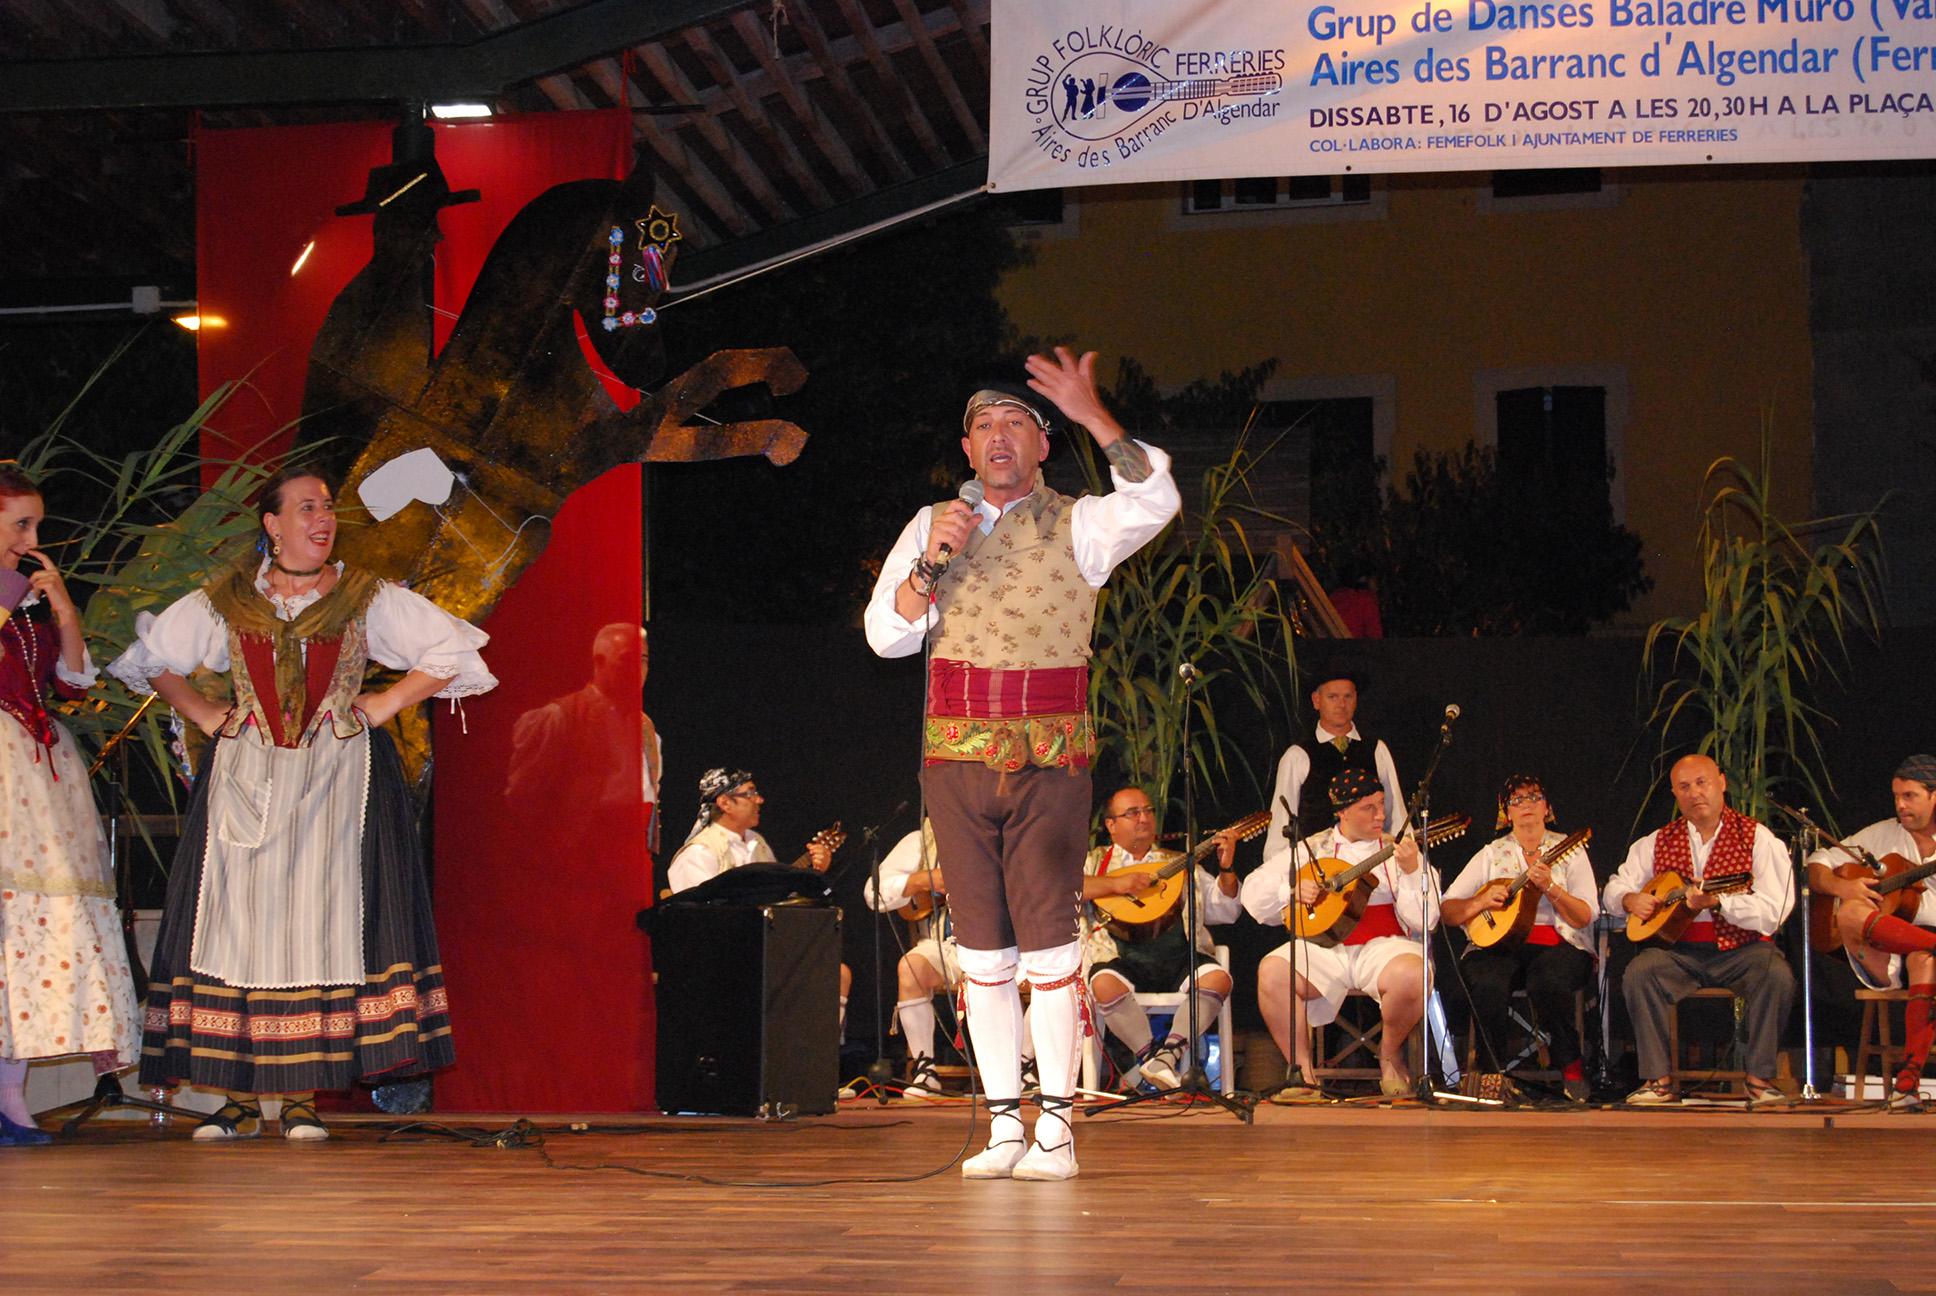 2014-08-15al17 BALADRE a Ferreries PepVerdu (455)